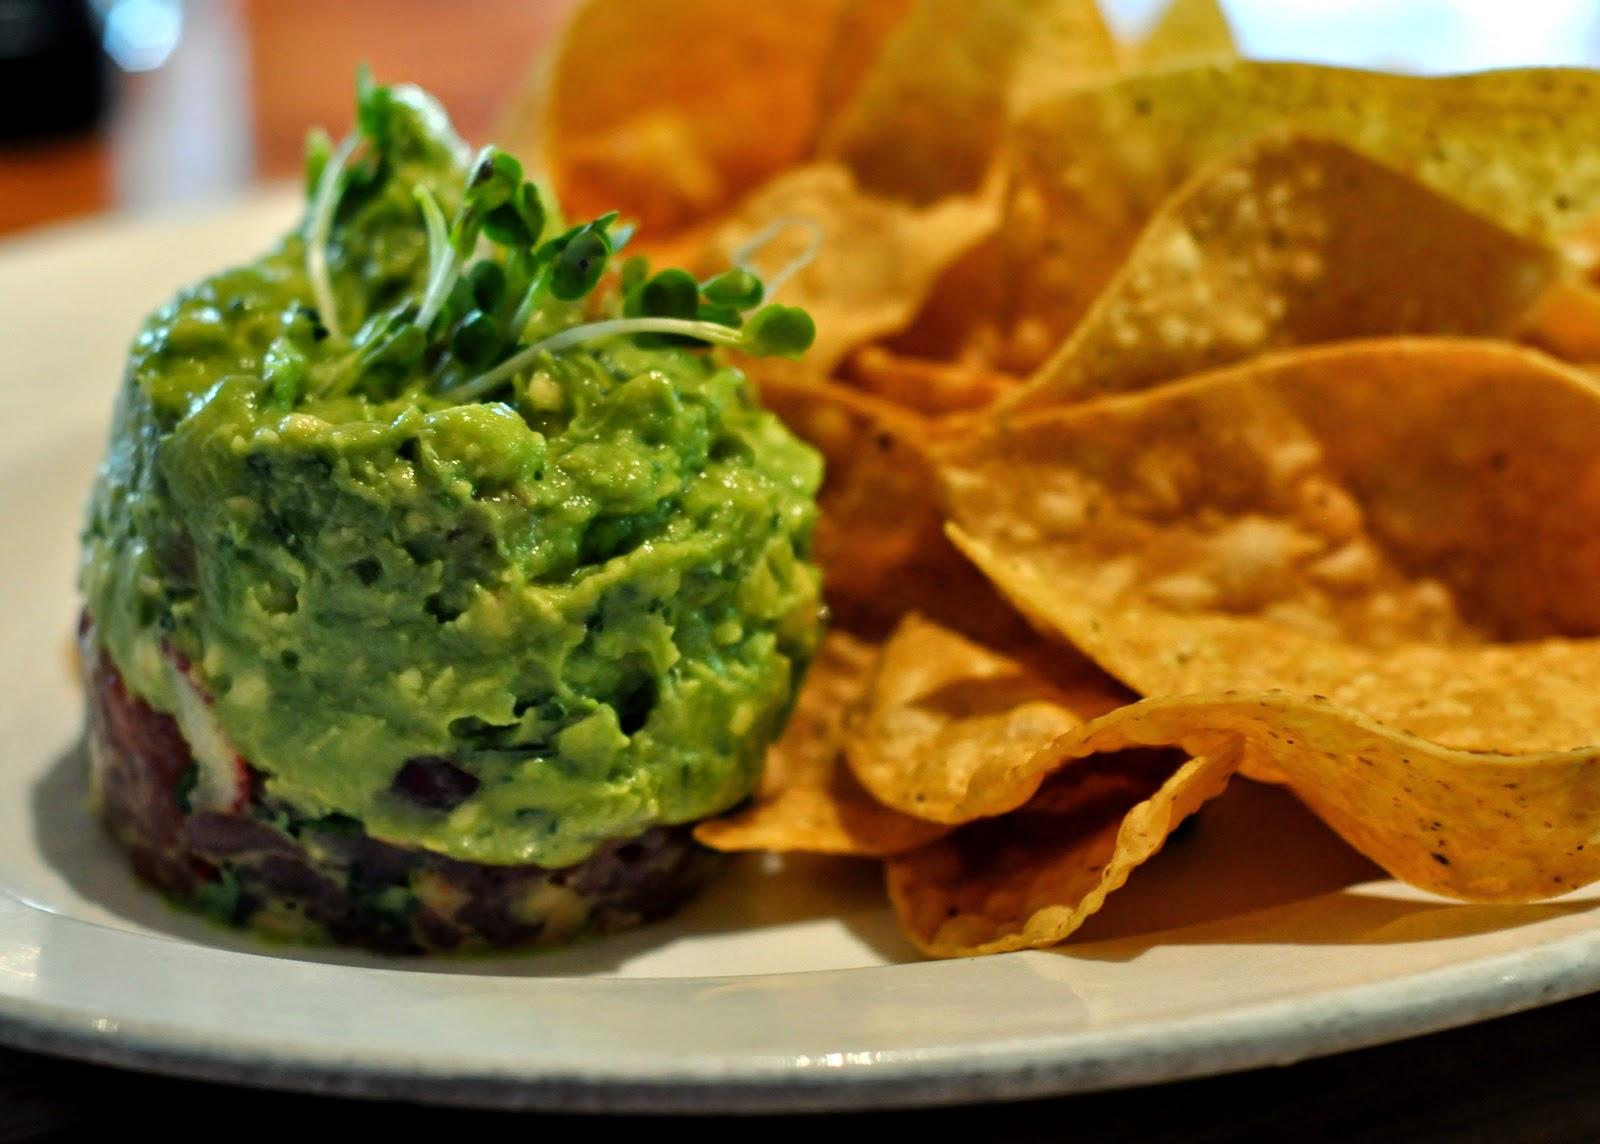 Tuna Tartare and Guacamole with Fresh Tortilla Chips - Chelsea's Kitchen - Phoenix, AZ | Taste As You Go